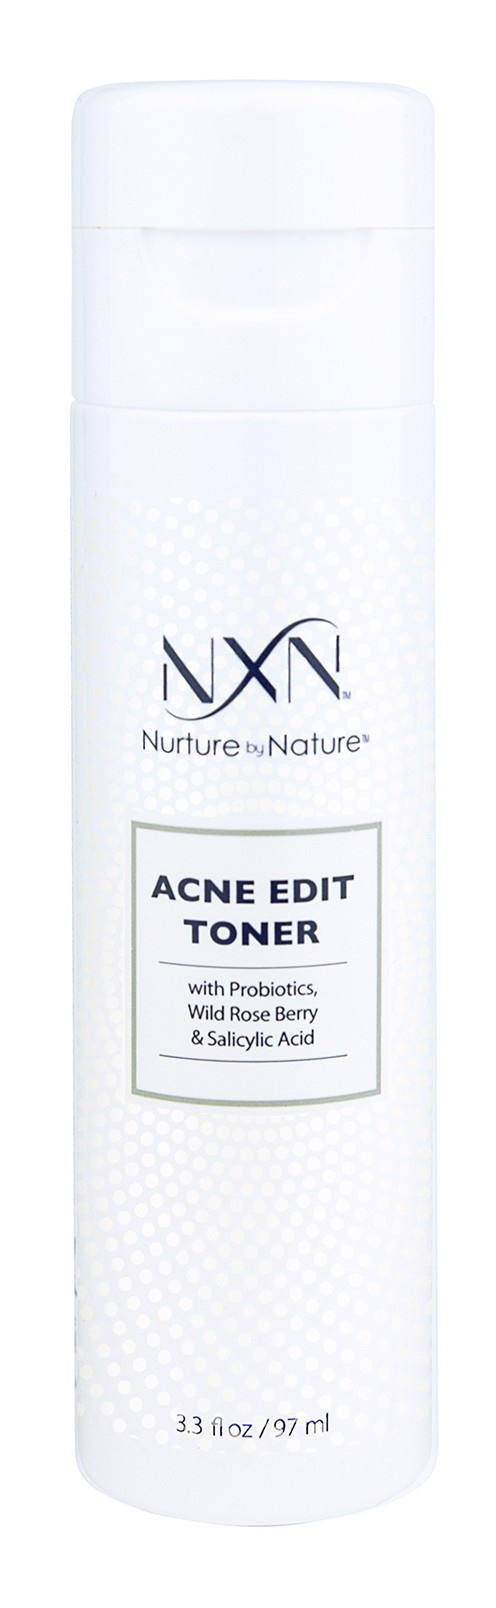 NXN Acne Edit Toner